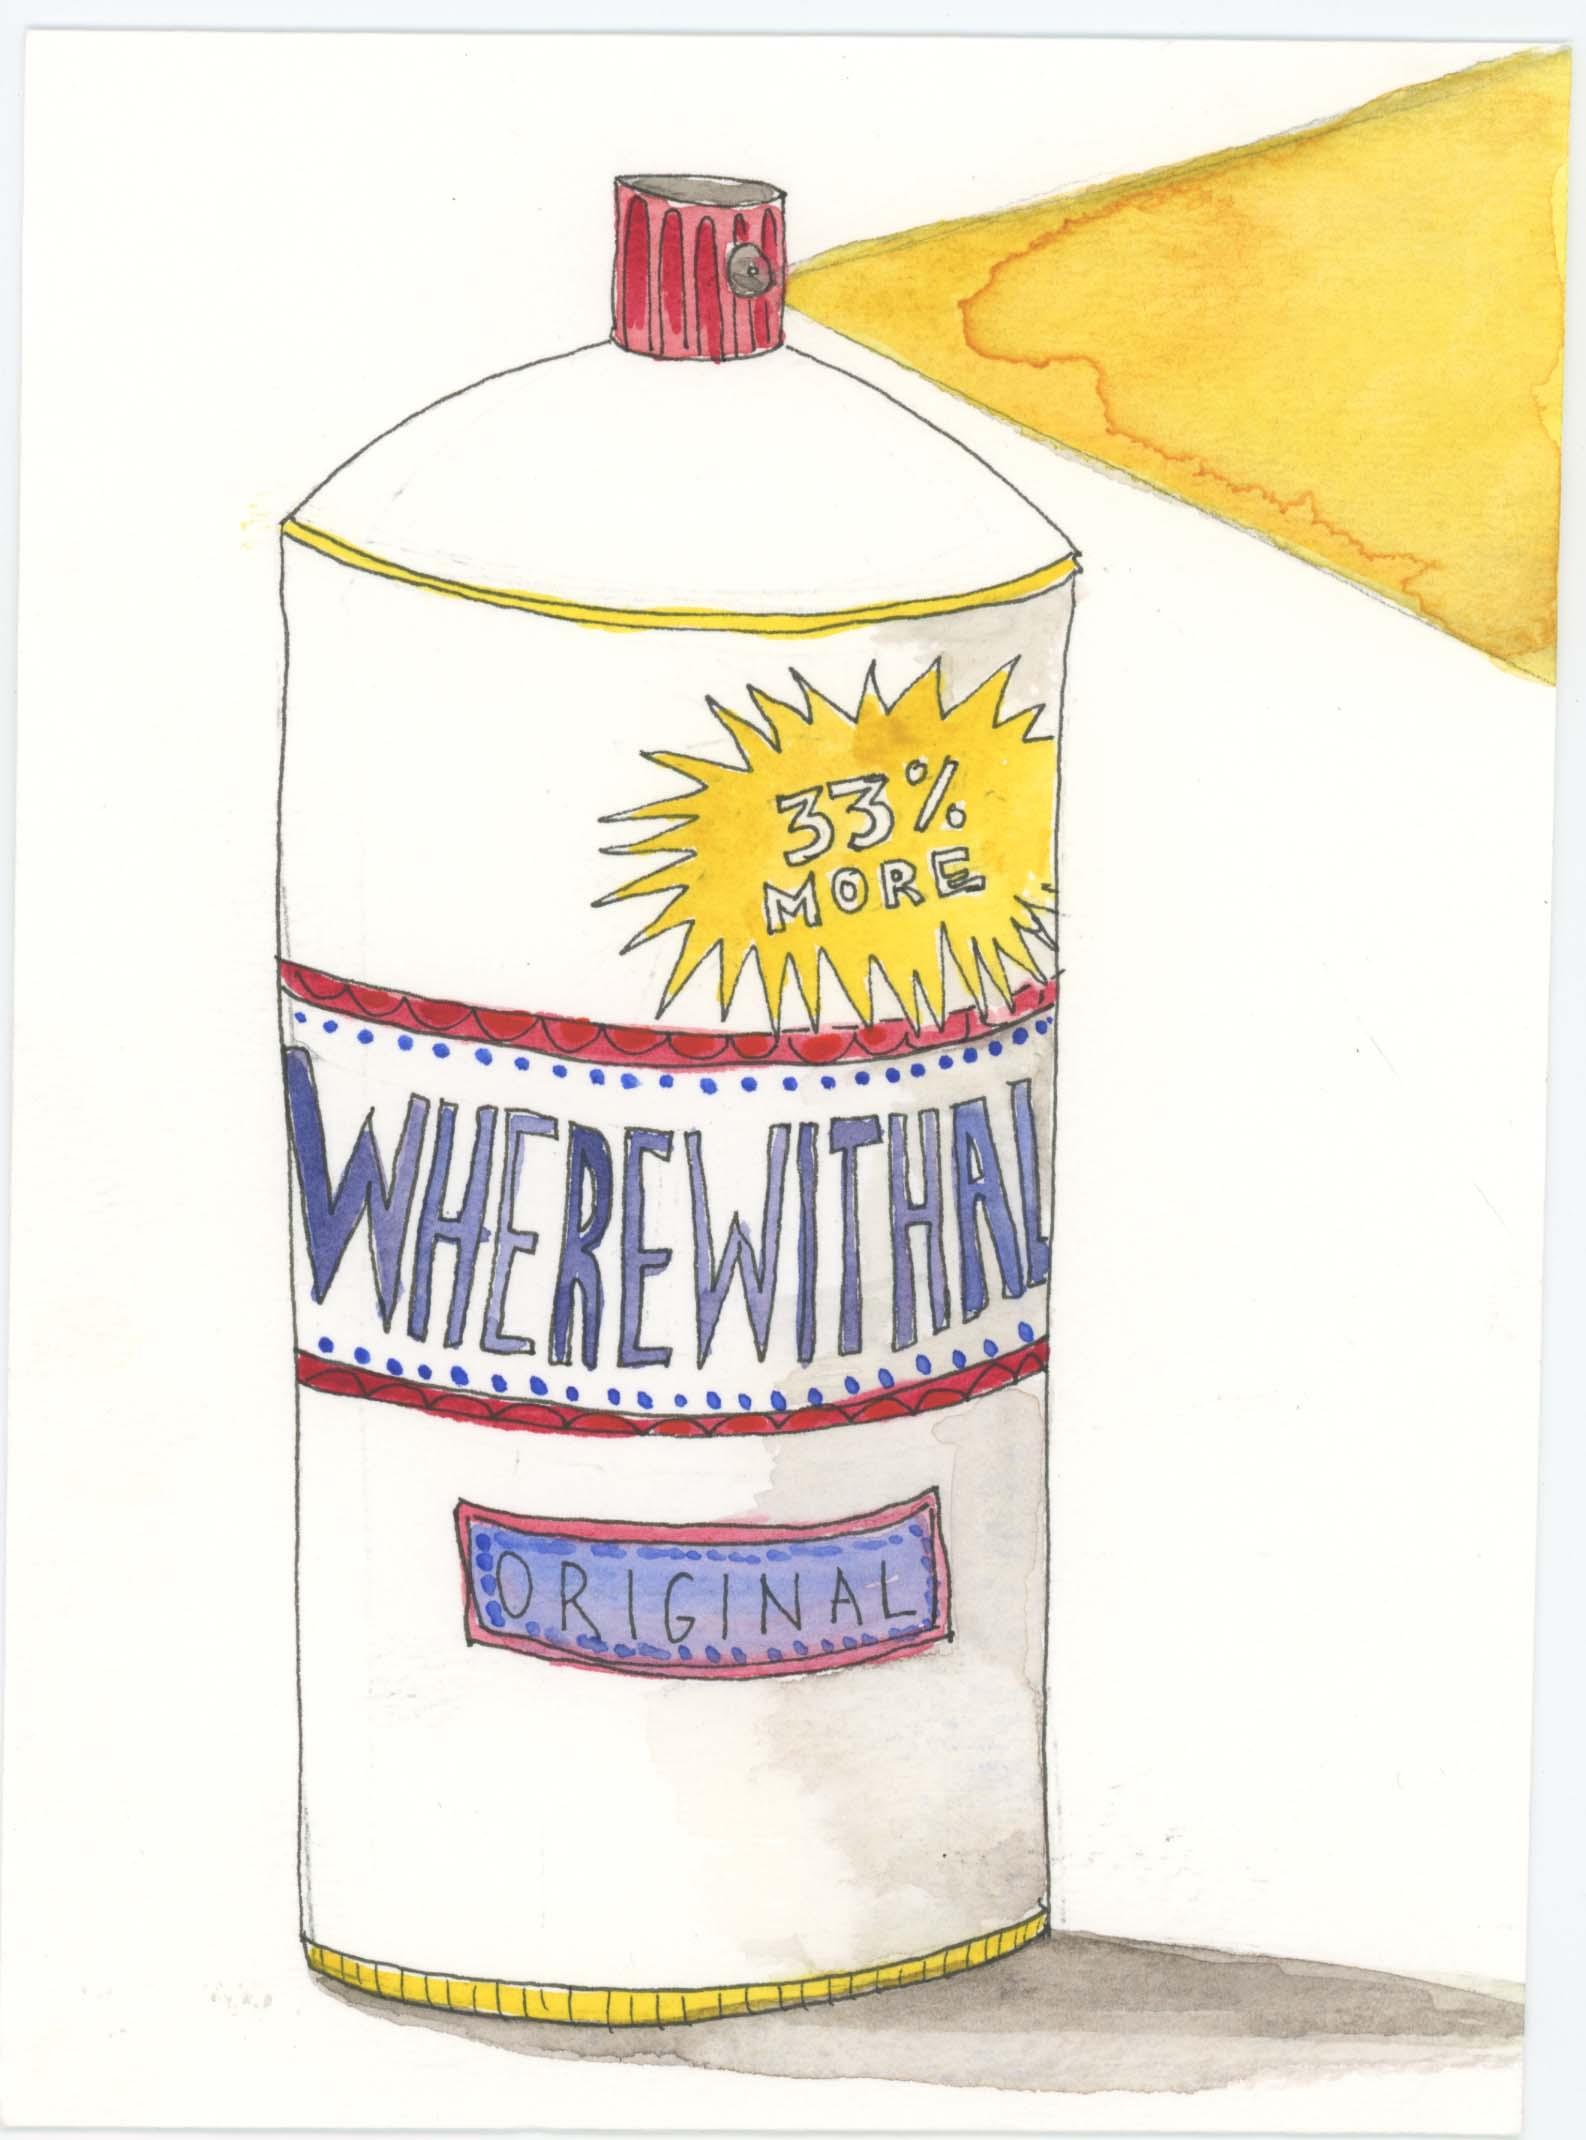 Wherewithal